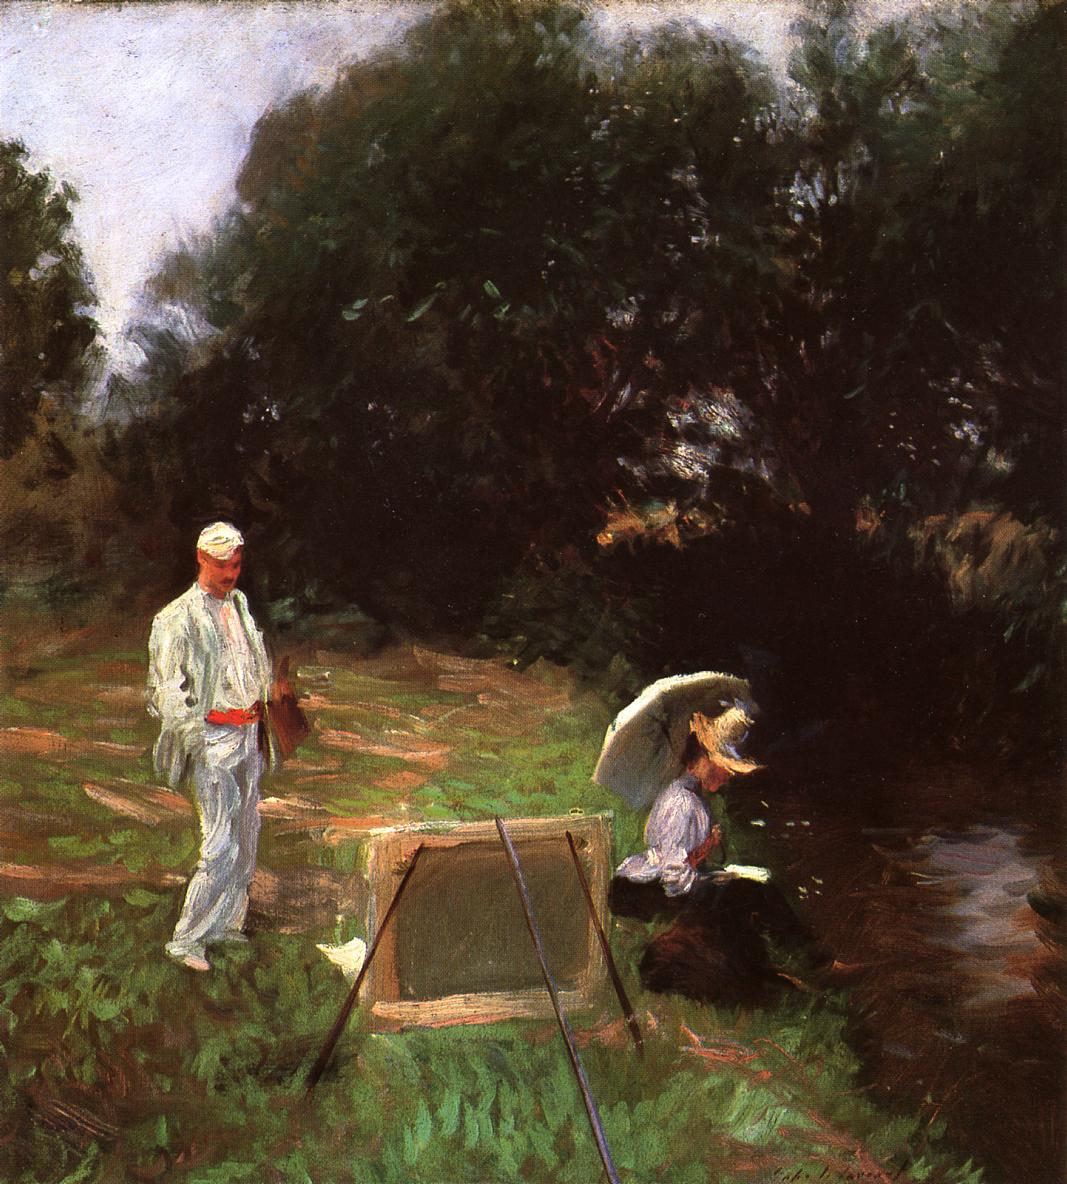 Dennis Miller Bunker Painting at Calcot 1888 | John Singer Sargent | Oil Painting